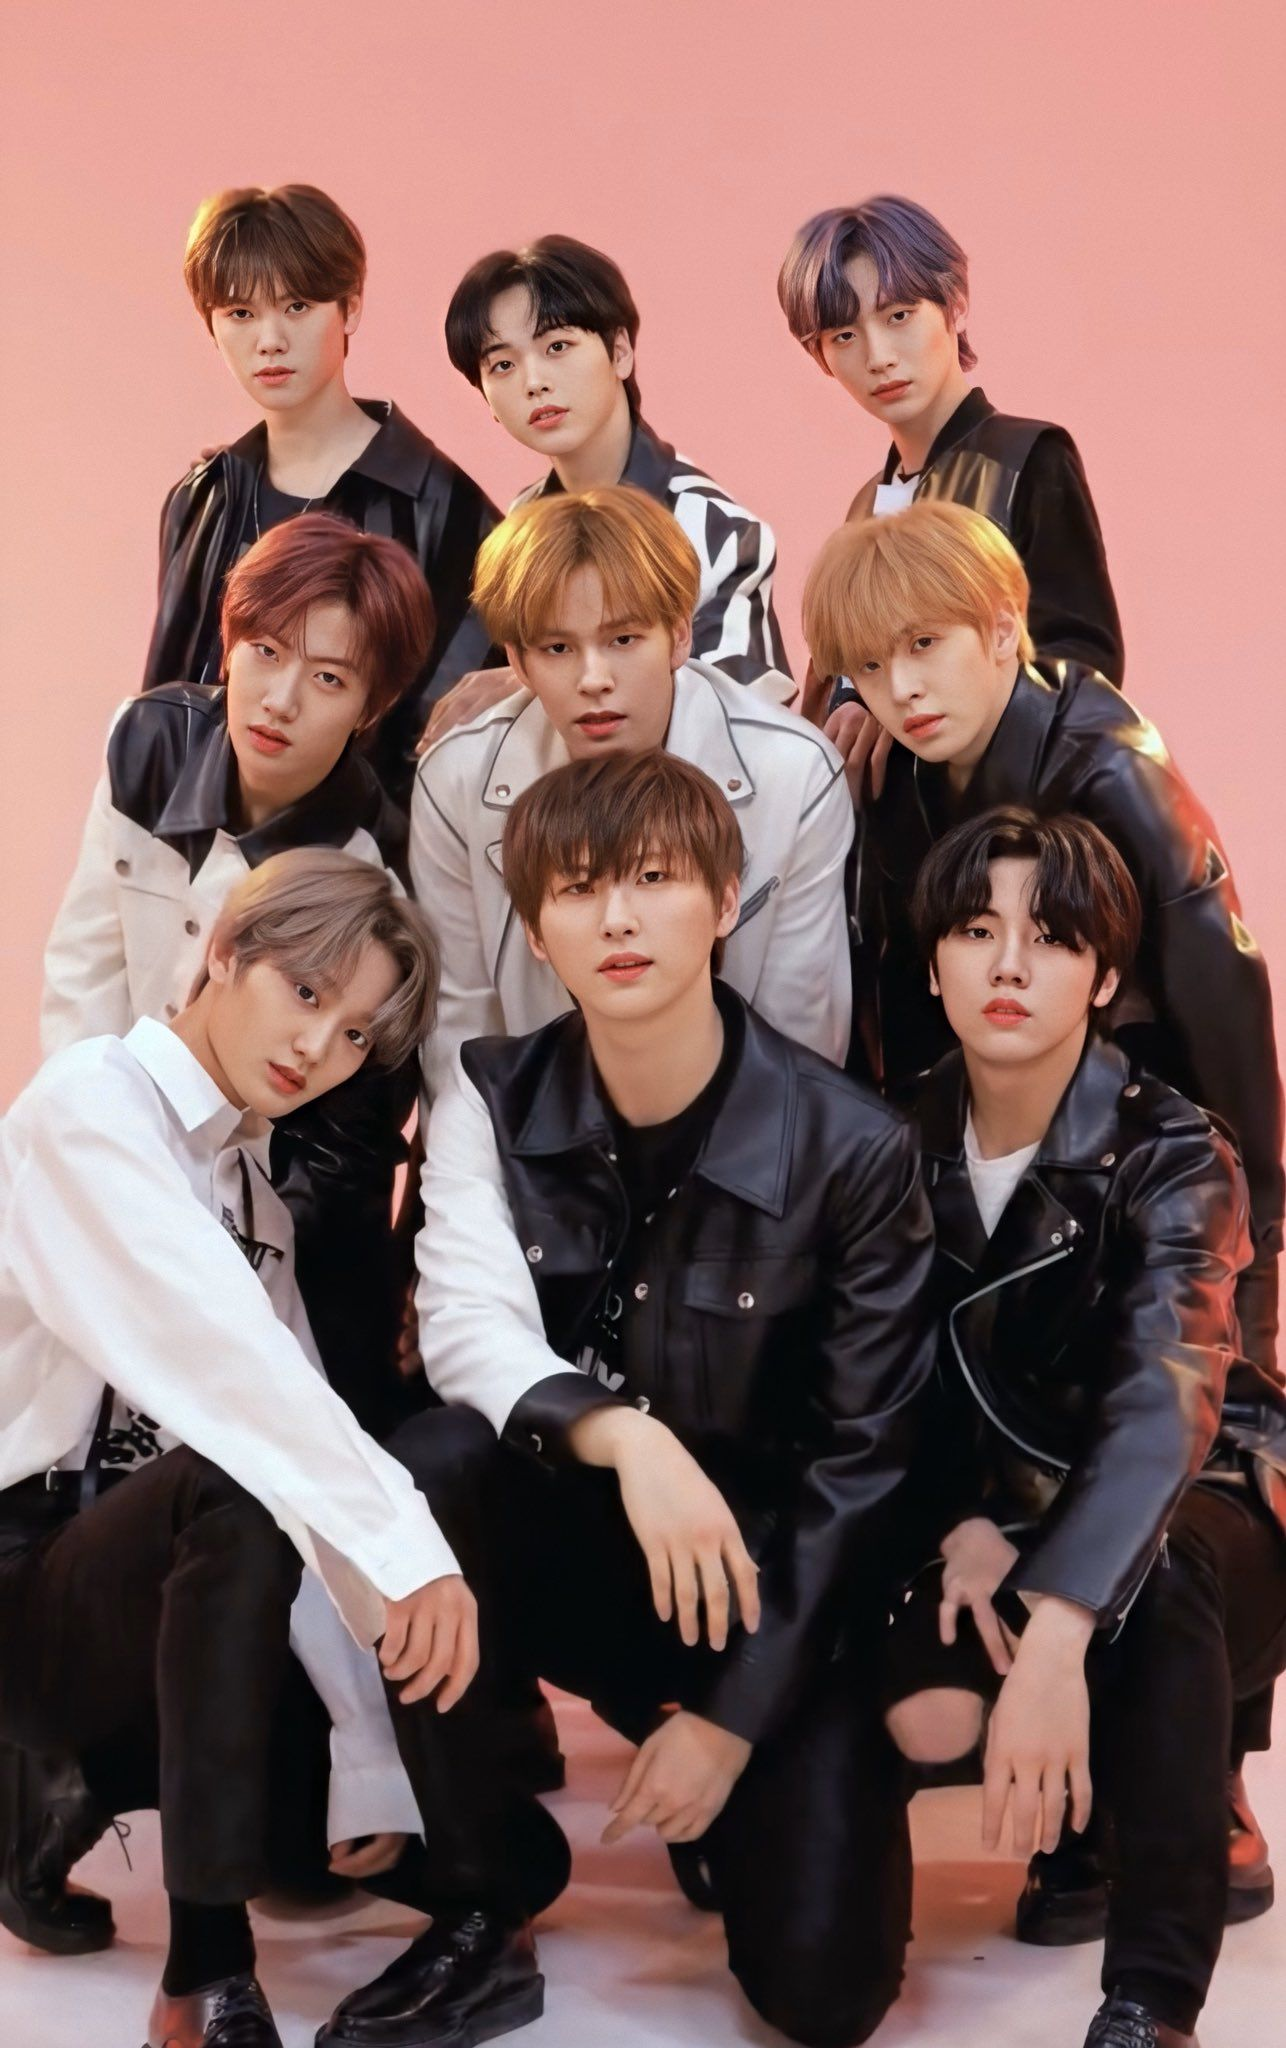 Cravity In 2020 Boy Groups Starship Entertainment K Pop Star